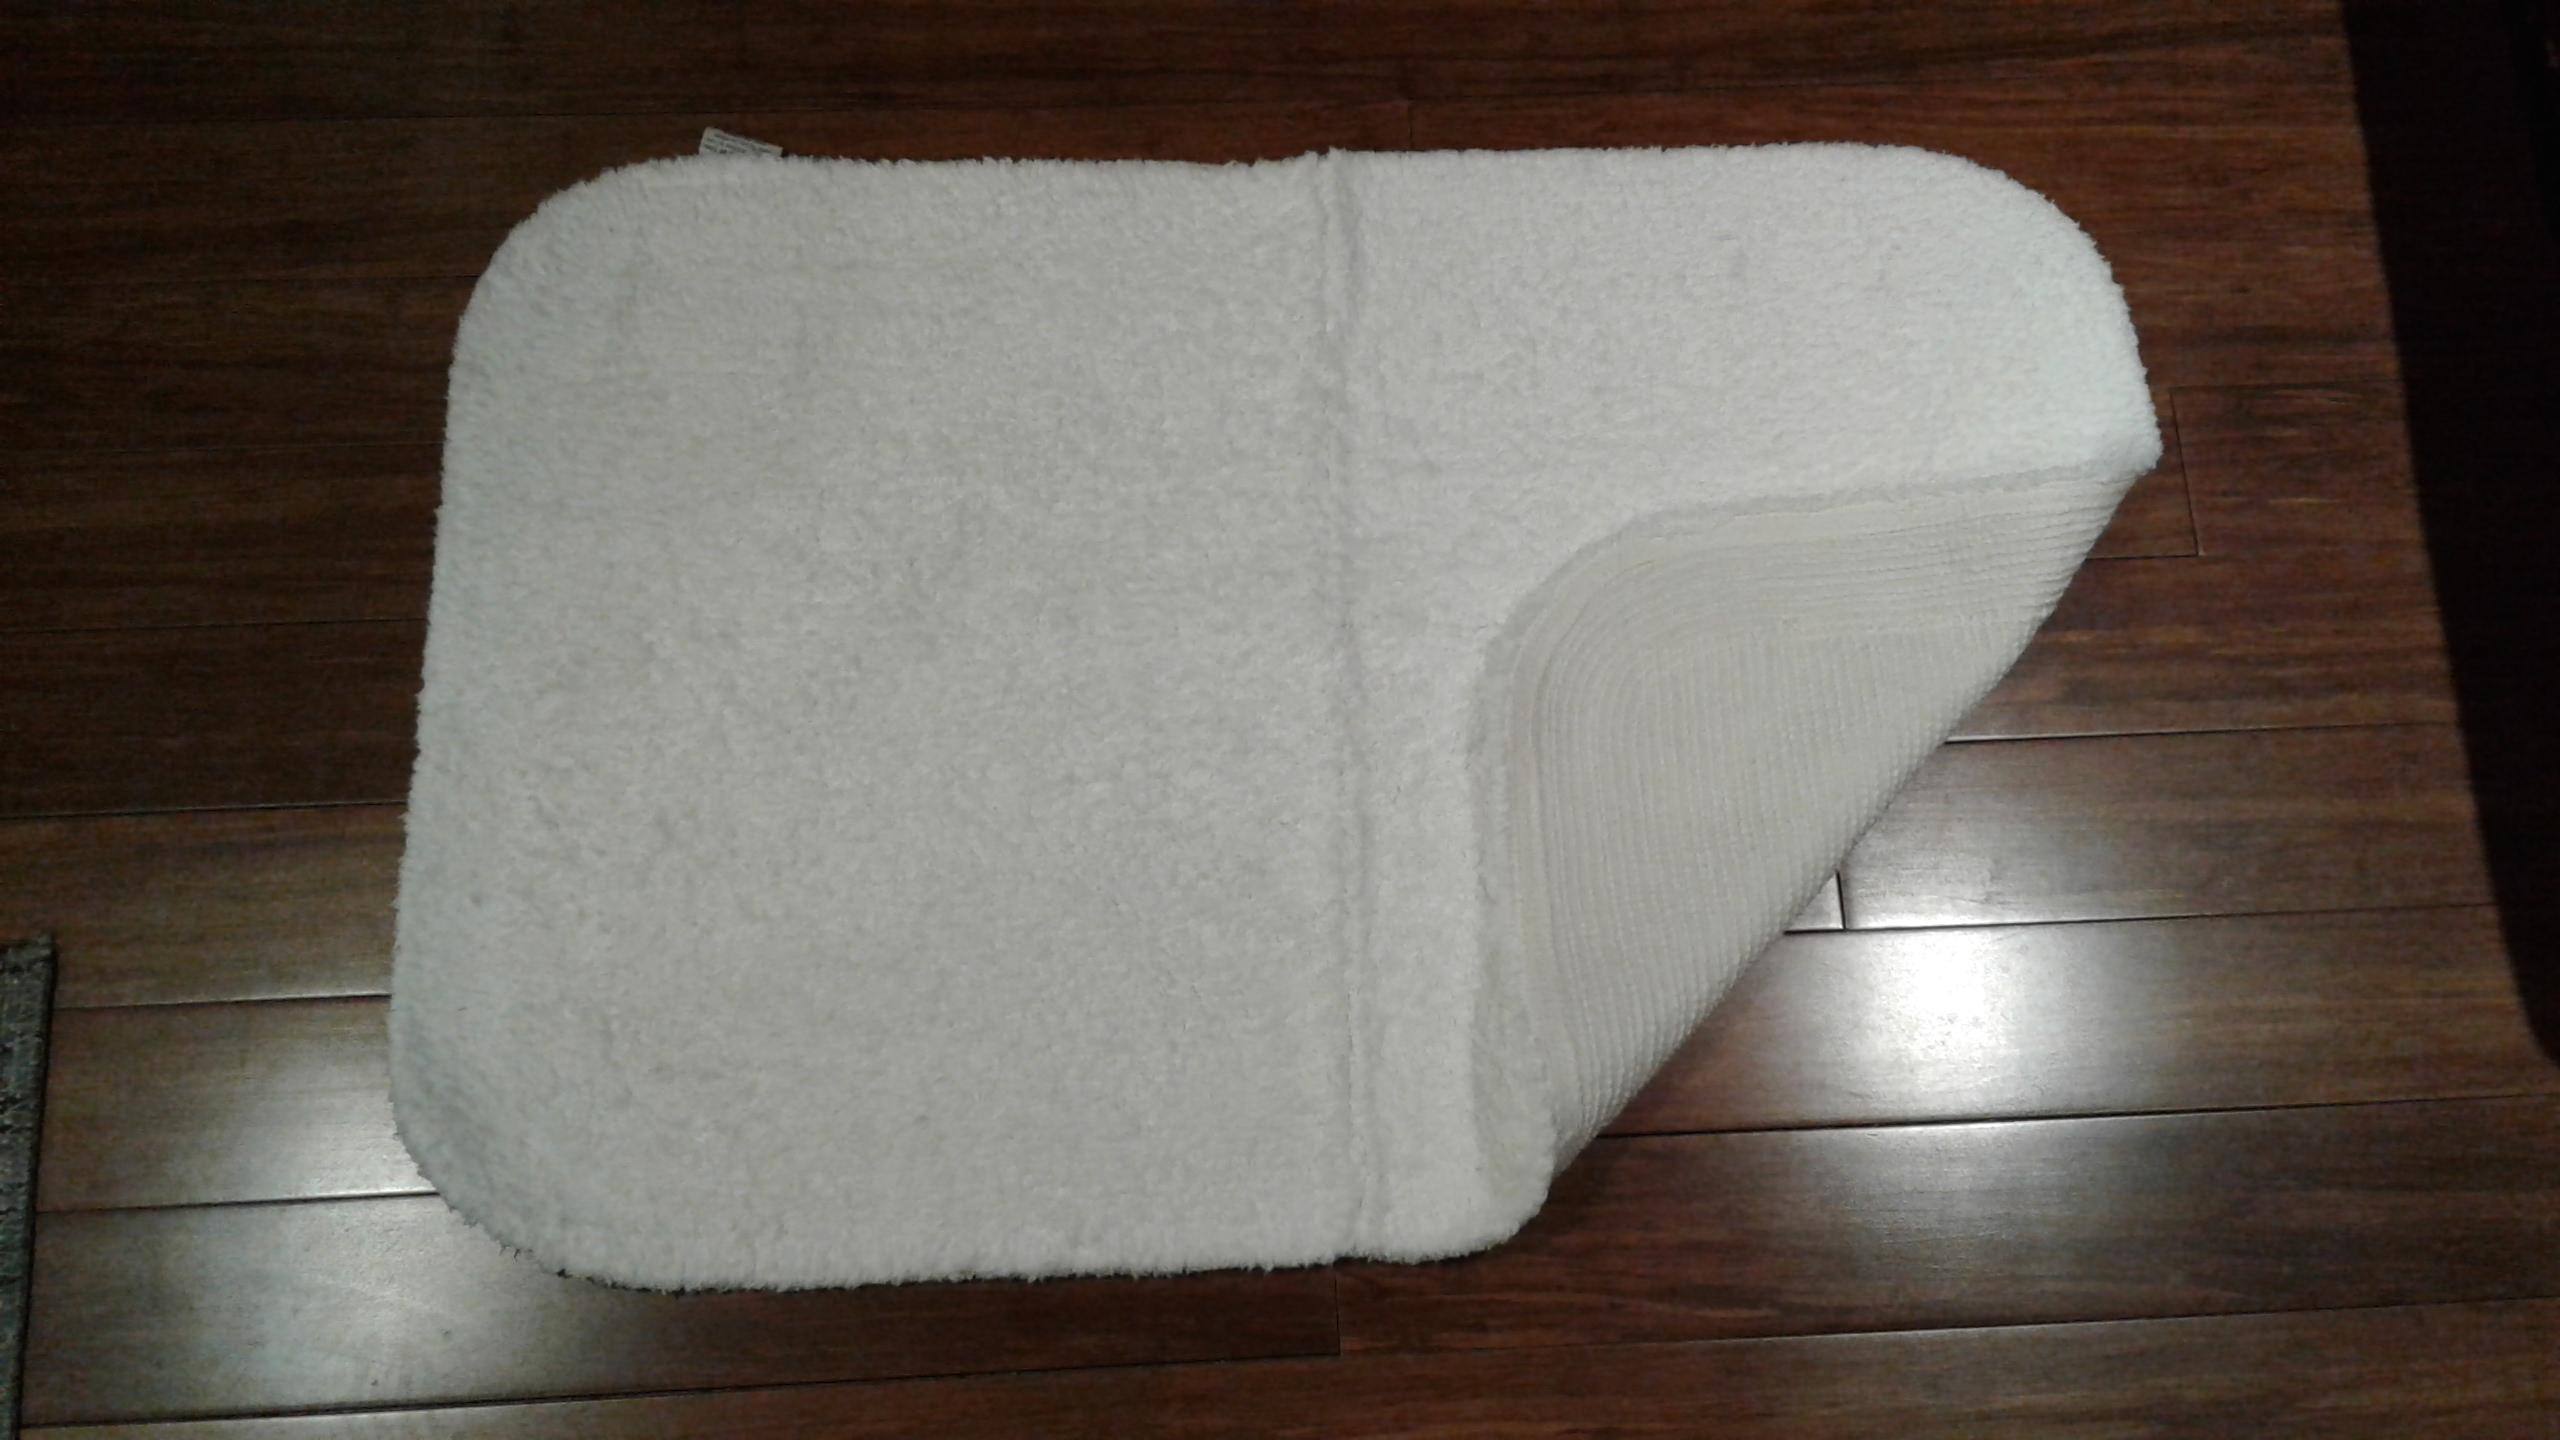 Plush Bathroom Rugs White Nonskid Reg $29.98  NOW $12.98